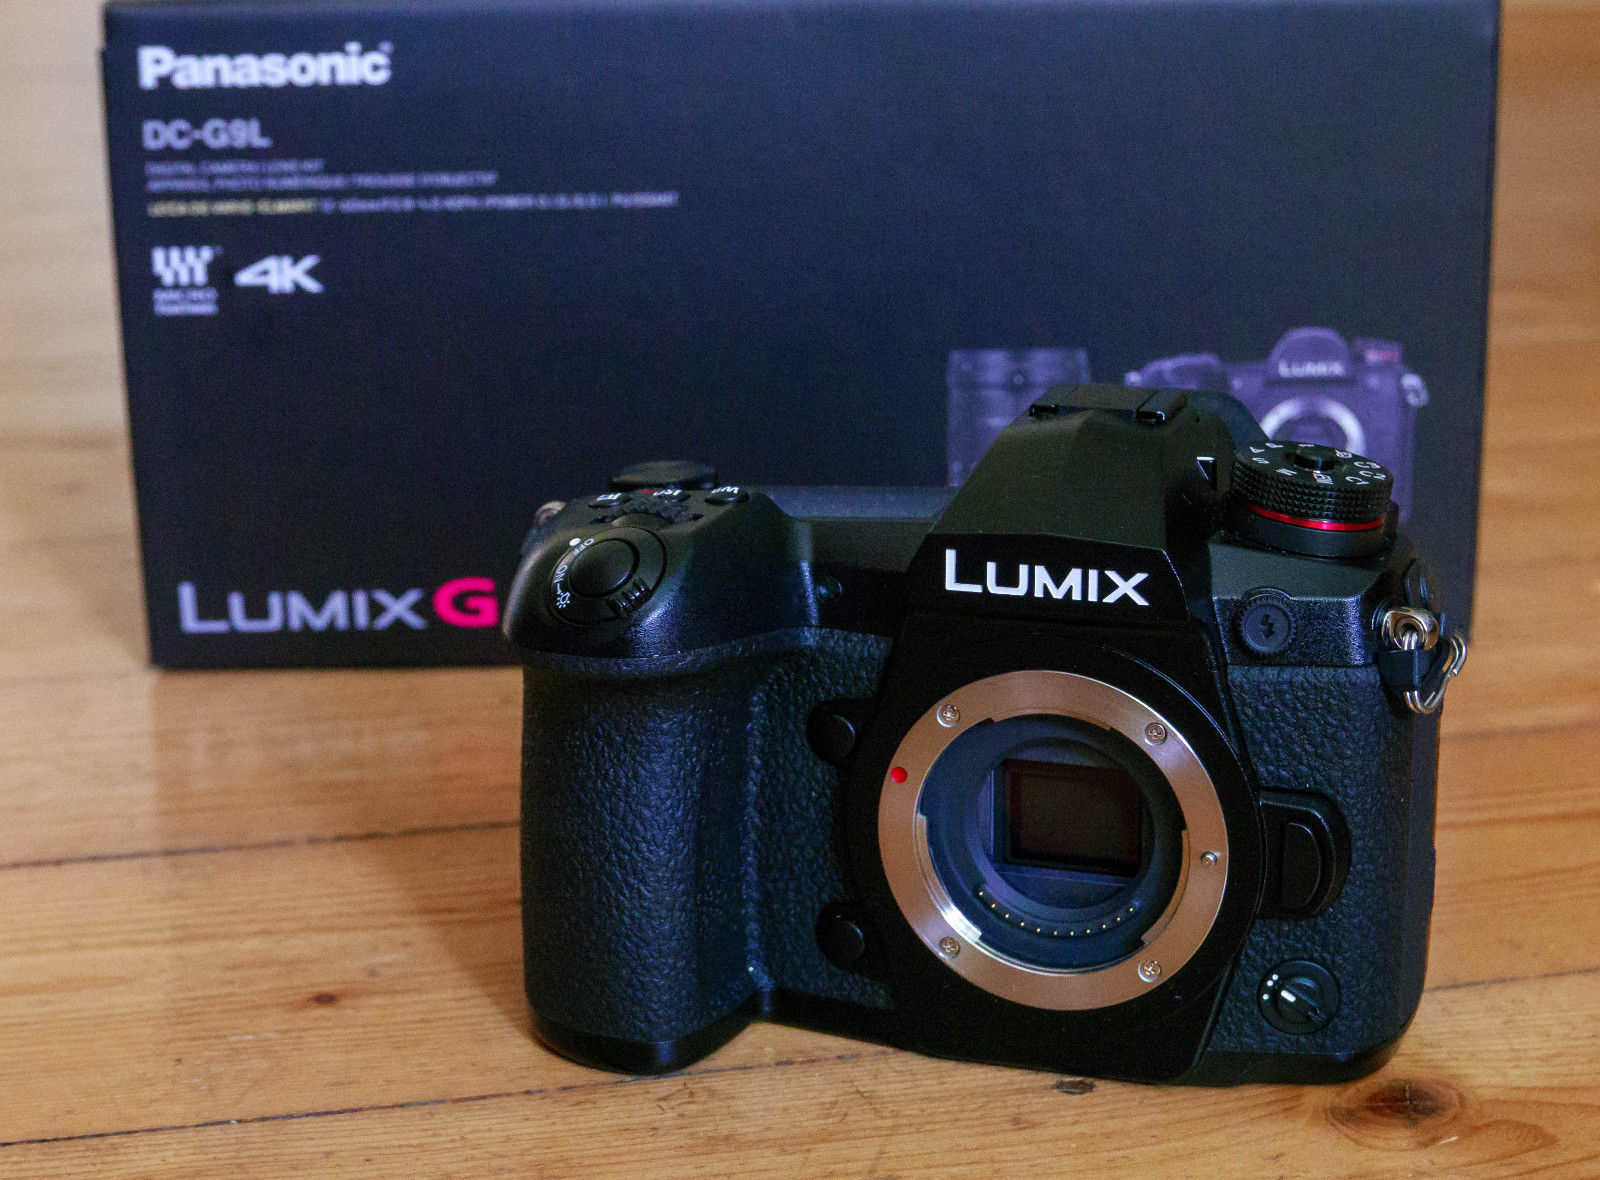 Panasonic Panasonic LUMIX DC-G9EG 20.3 MP Digital Camera - schwarz (Nur Gehäuse)